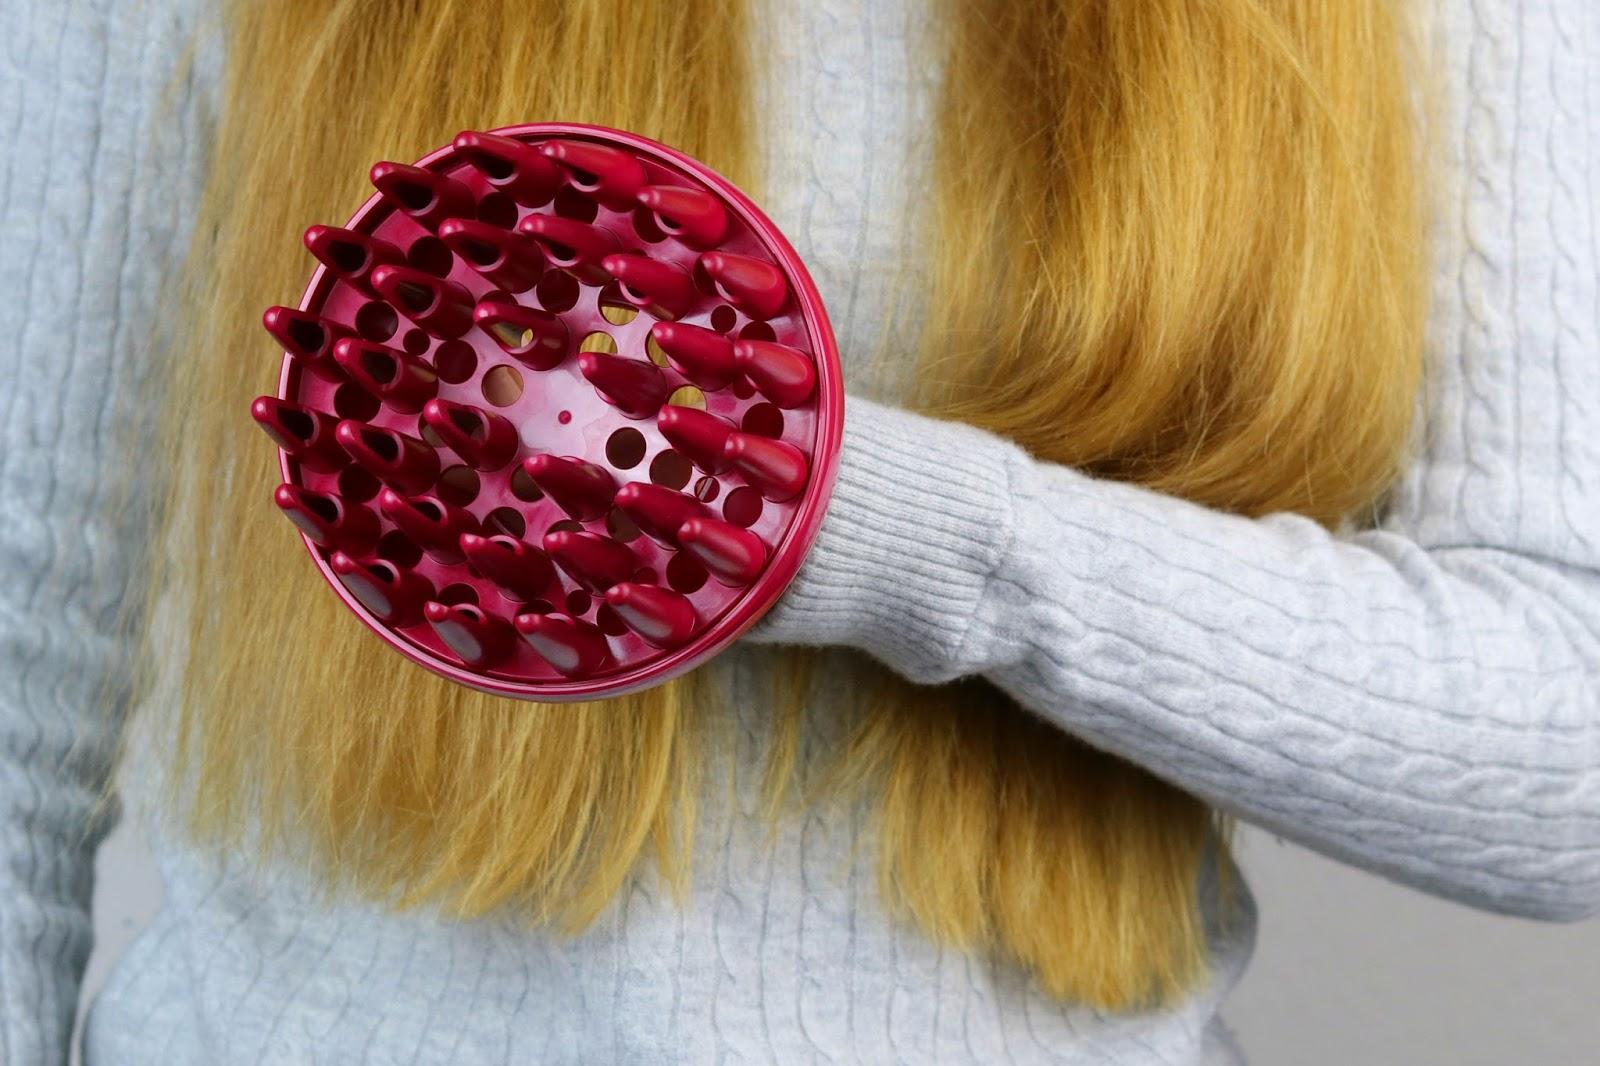 Panasonic EH-NA65 Haartrockner, konsumgöttinnen, Hair Dryer, spendet fechtigkeit, glänzendes Haar, glättet die Haarstruktur, Review, Erfahrung, Haircare, Haarpflege, nanoe Technologie, Föhn, Aufsätze,